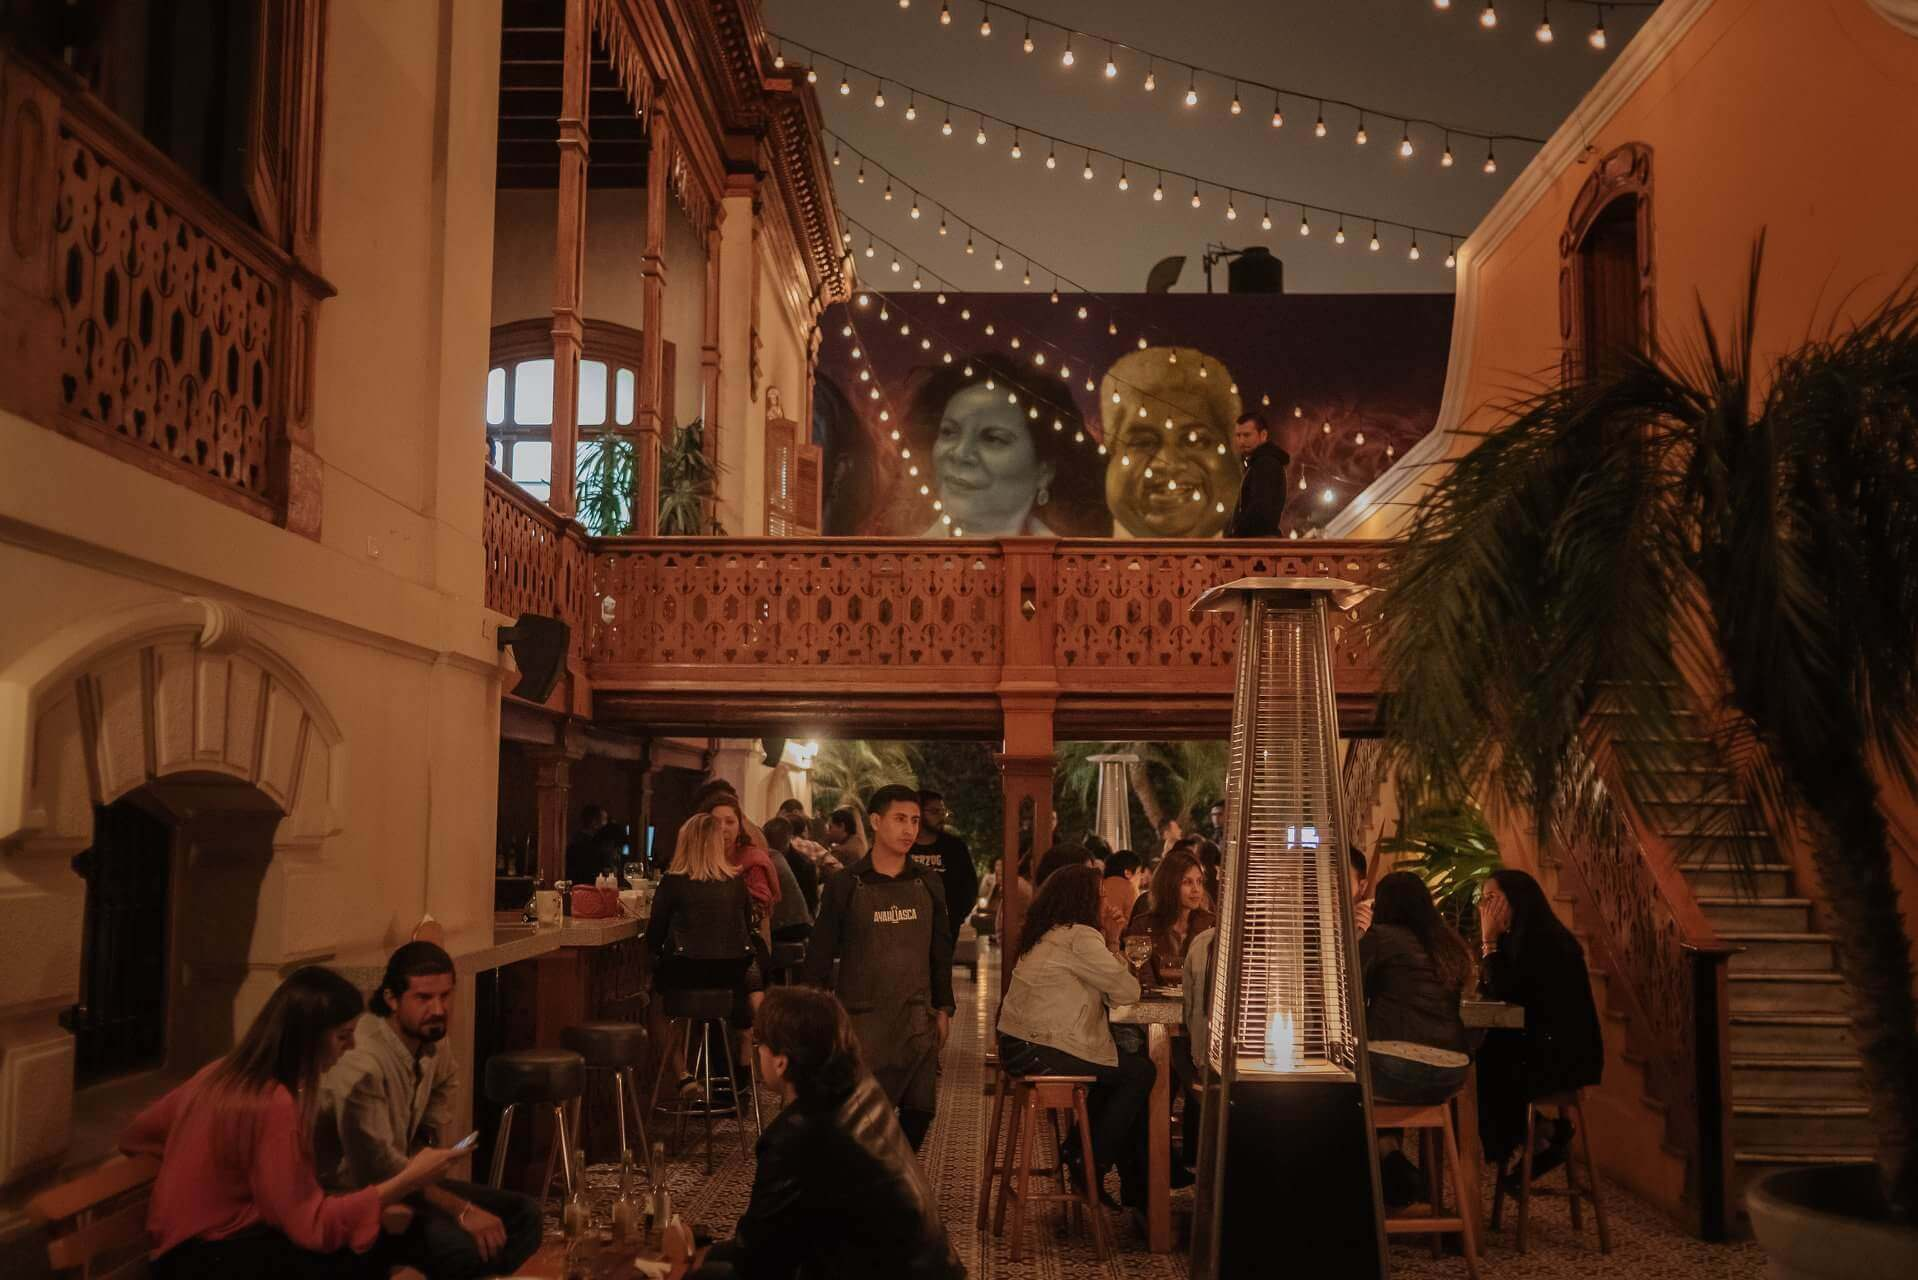 O bar Ayahuasca fica perto do agitado centro de Barranco